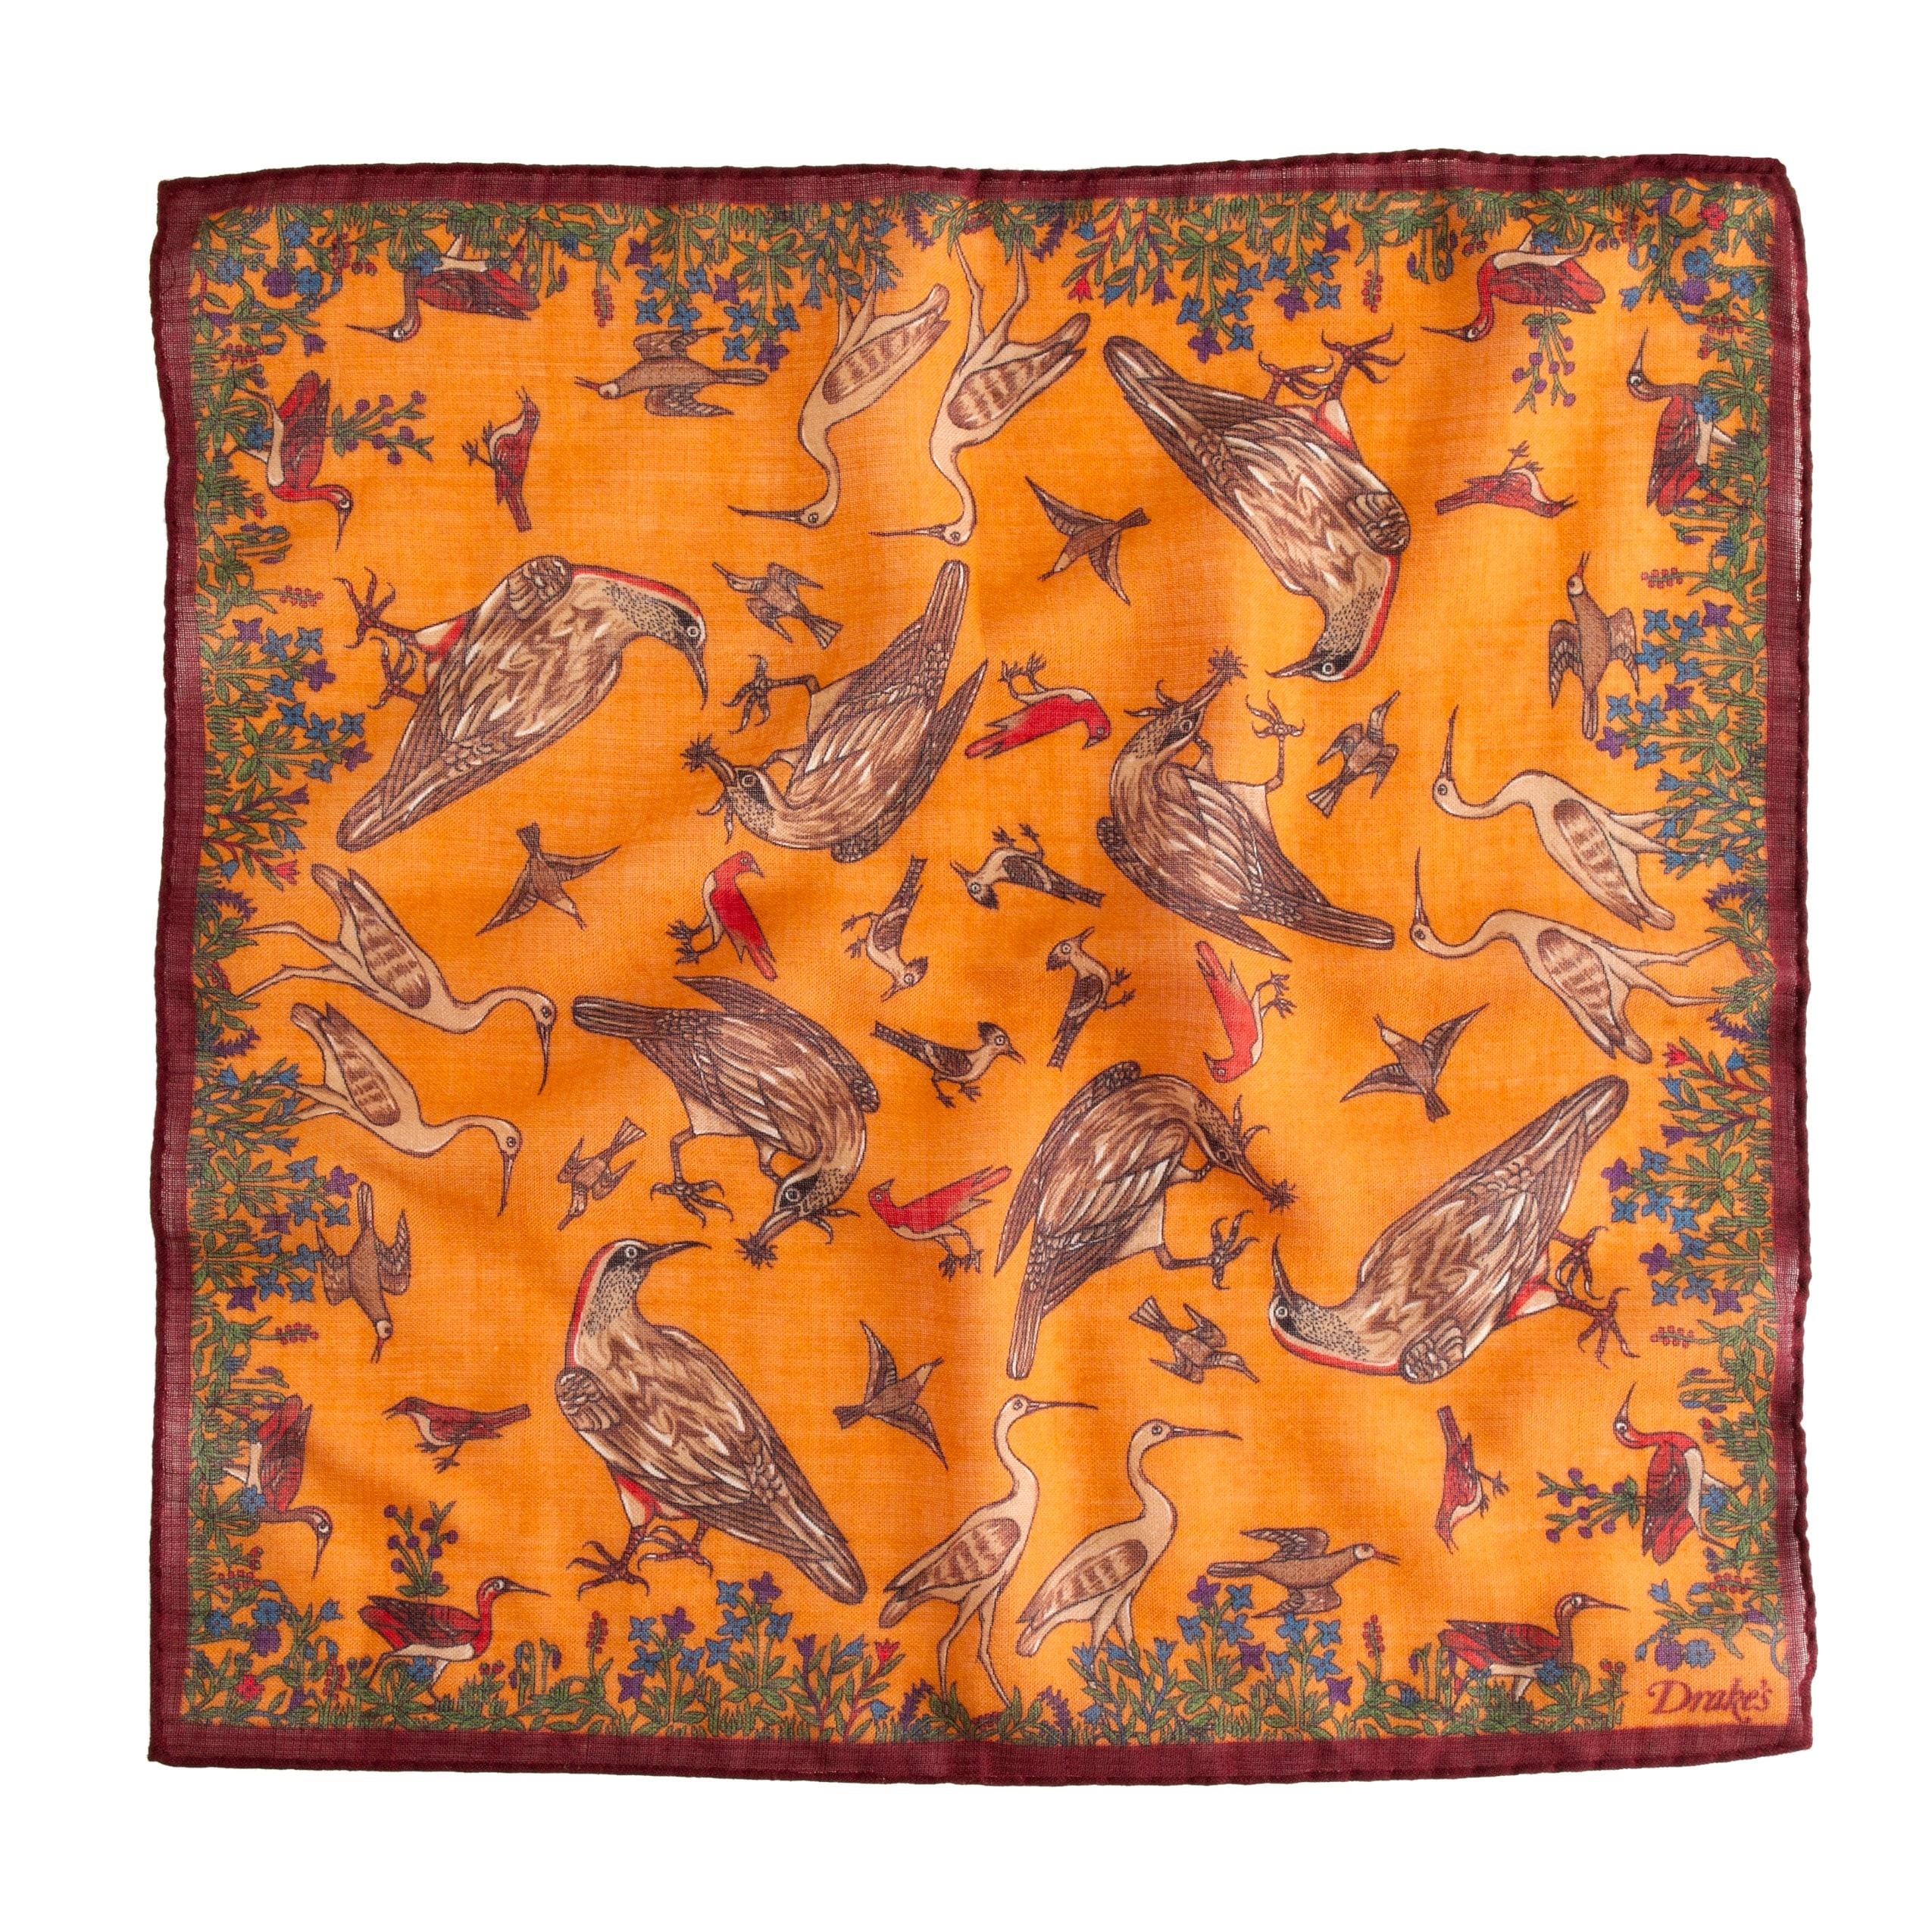 Drake's® bird-print handkerchief